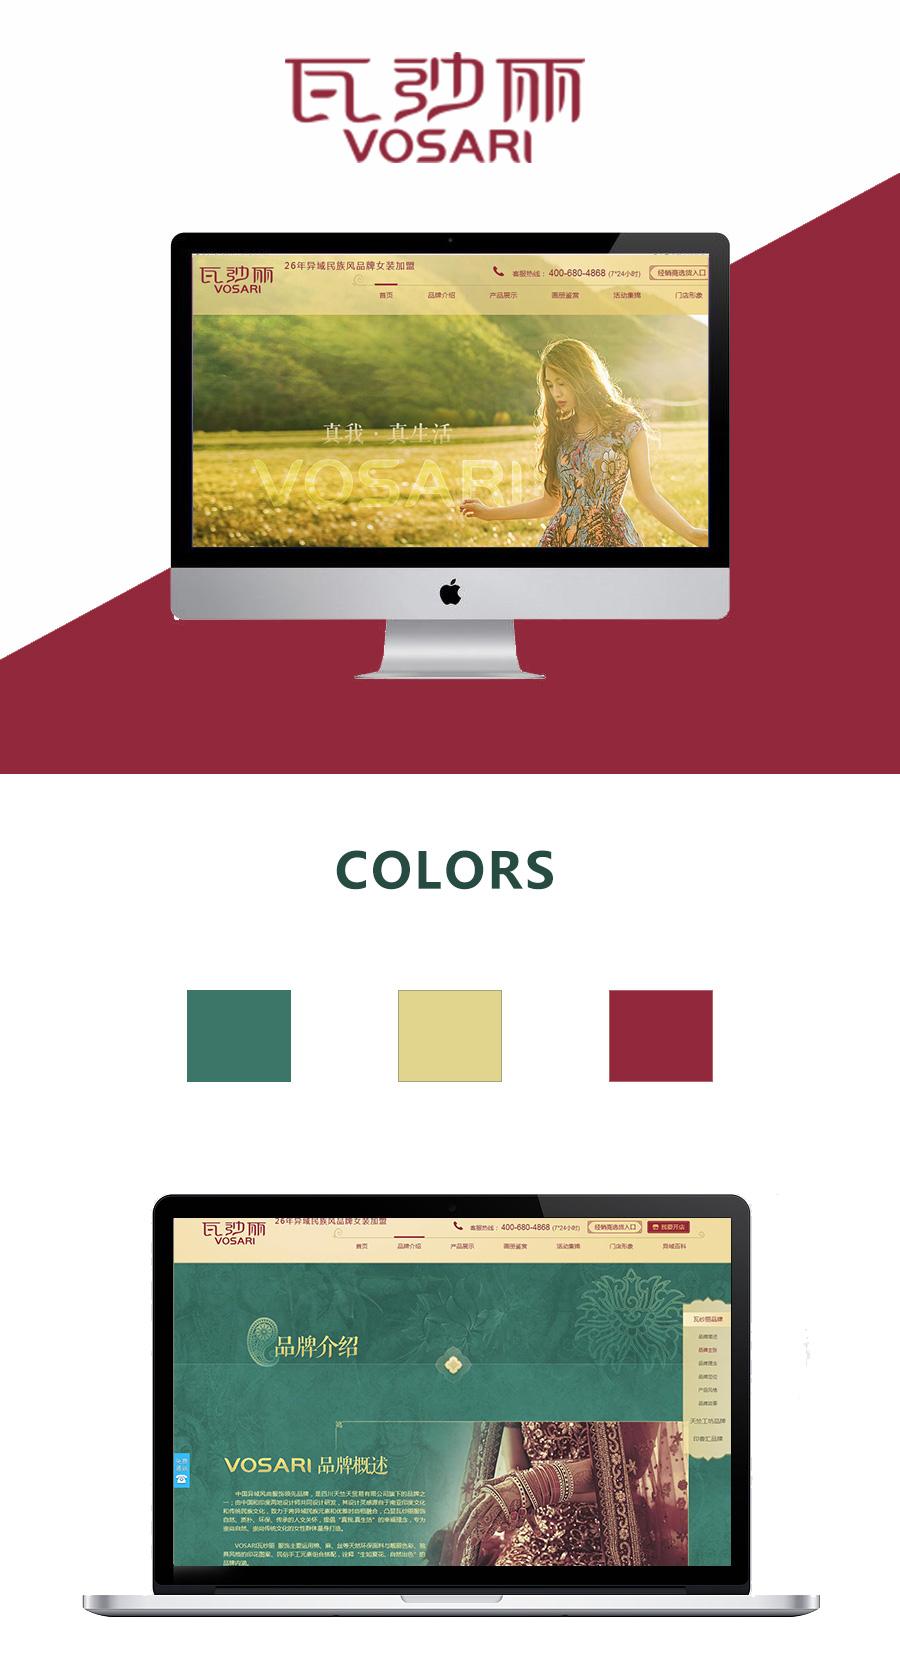 VOSARI | 瓦沙丽网站建设案例_服装品网站建设案例